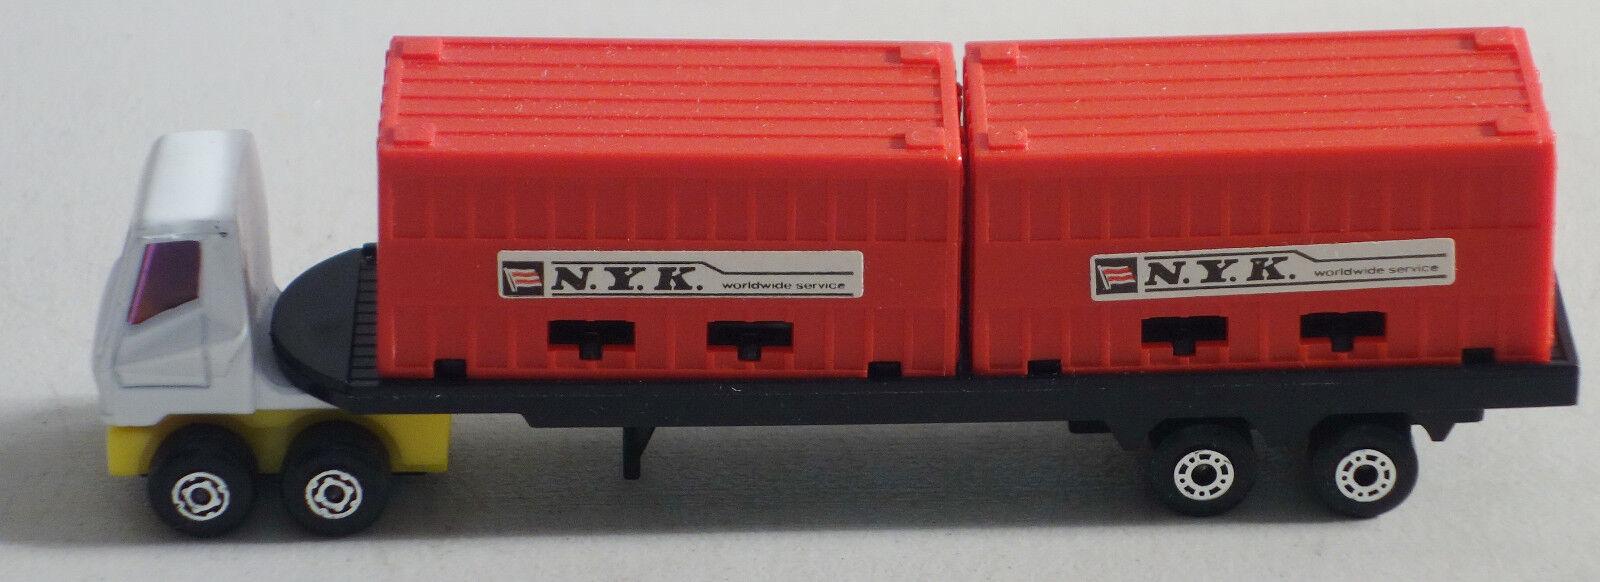 Dte lesney matchbox - konvoi trk ps-1 weiße   Gelb cab w   2 rot  vor .